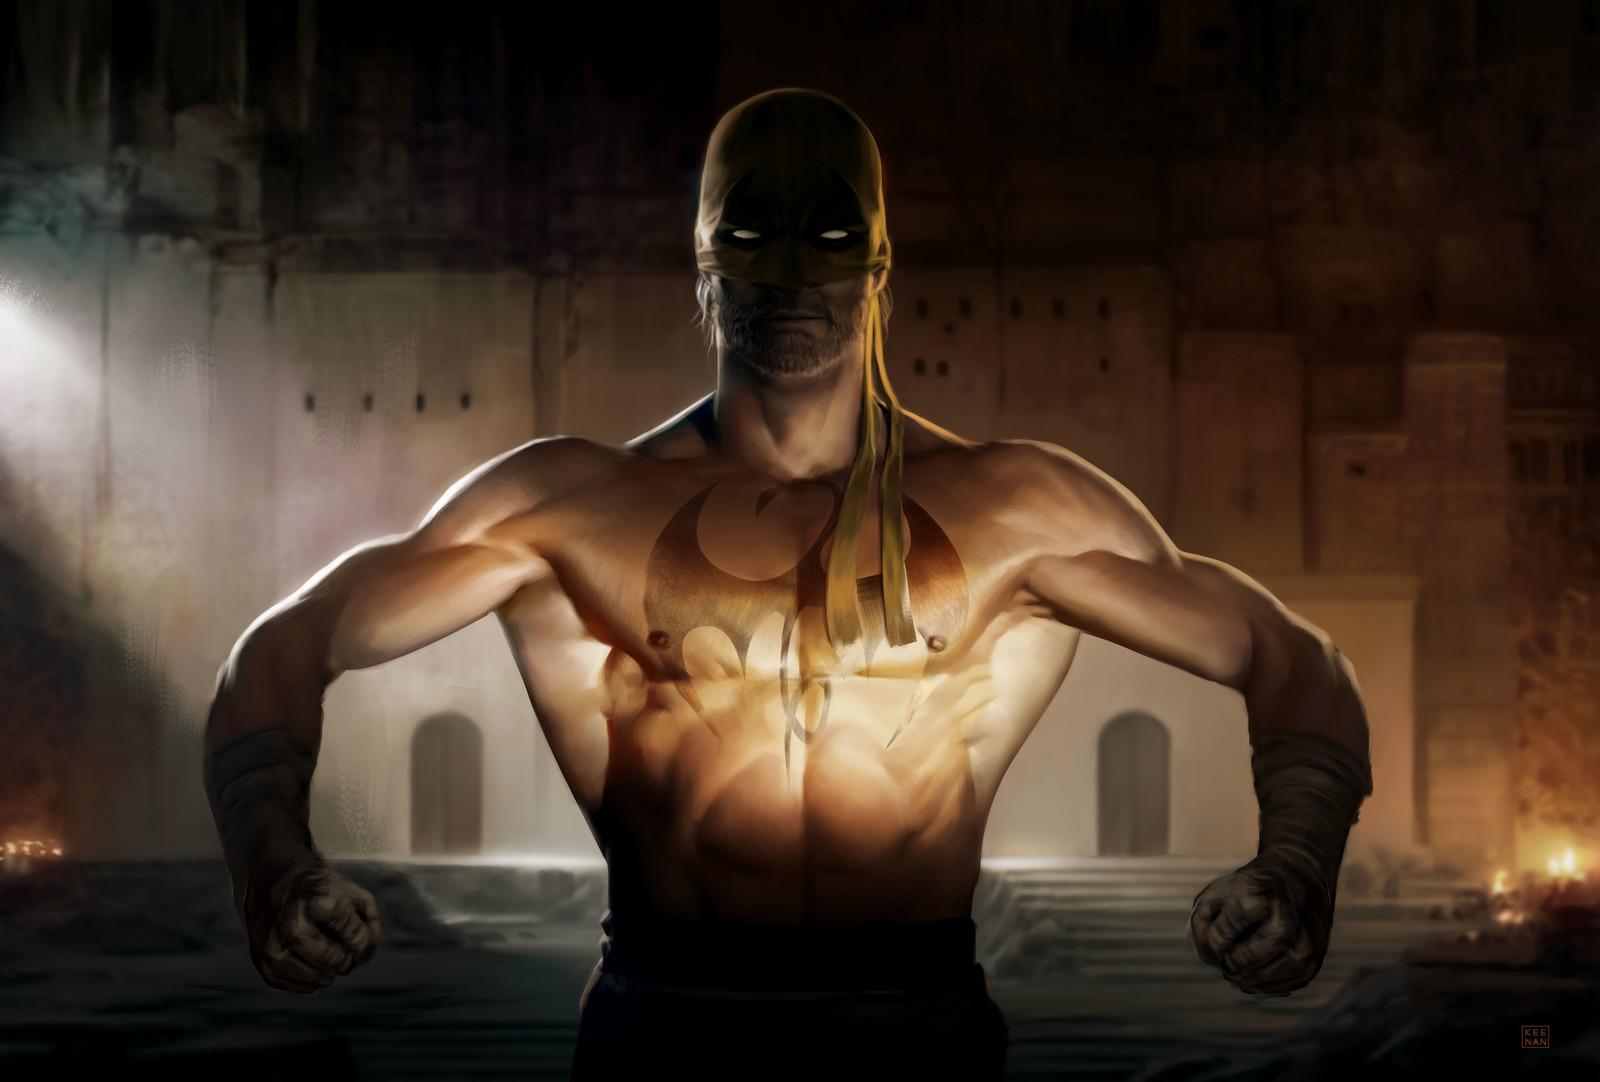 Iron Fist Temple of Shou Lao